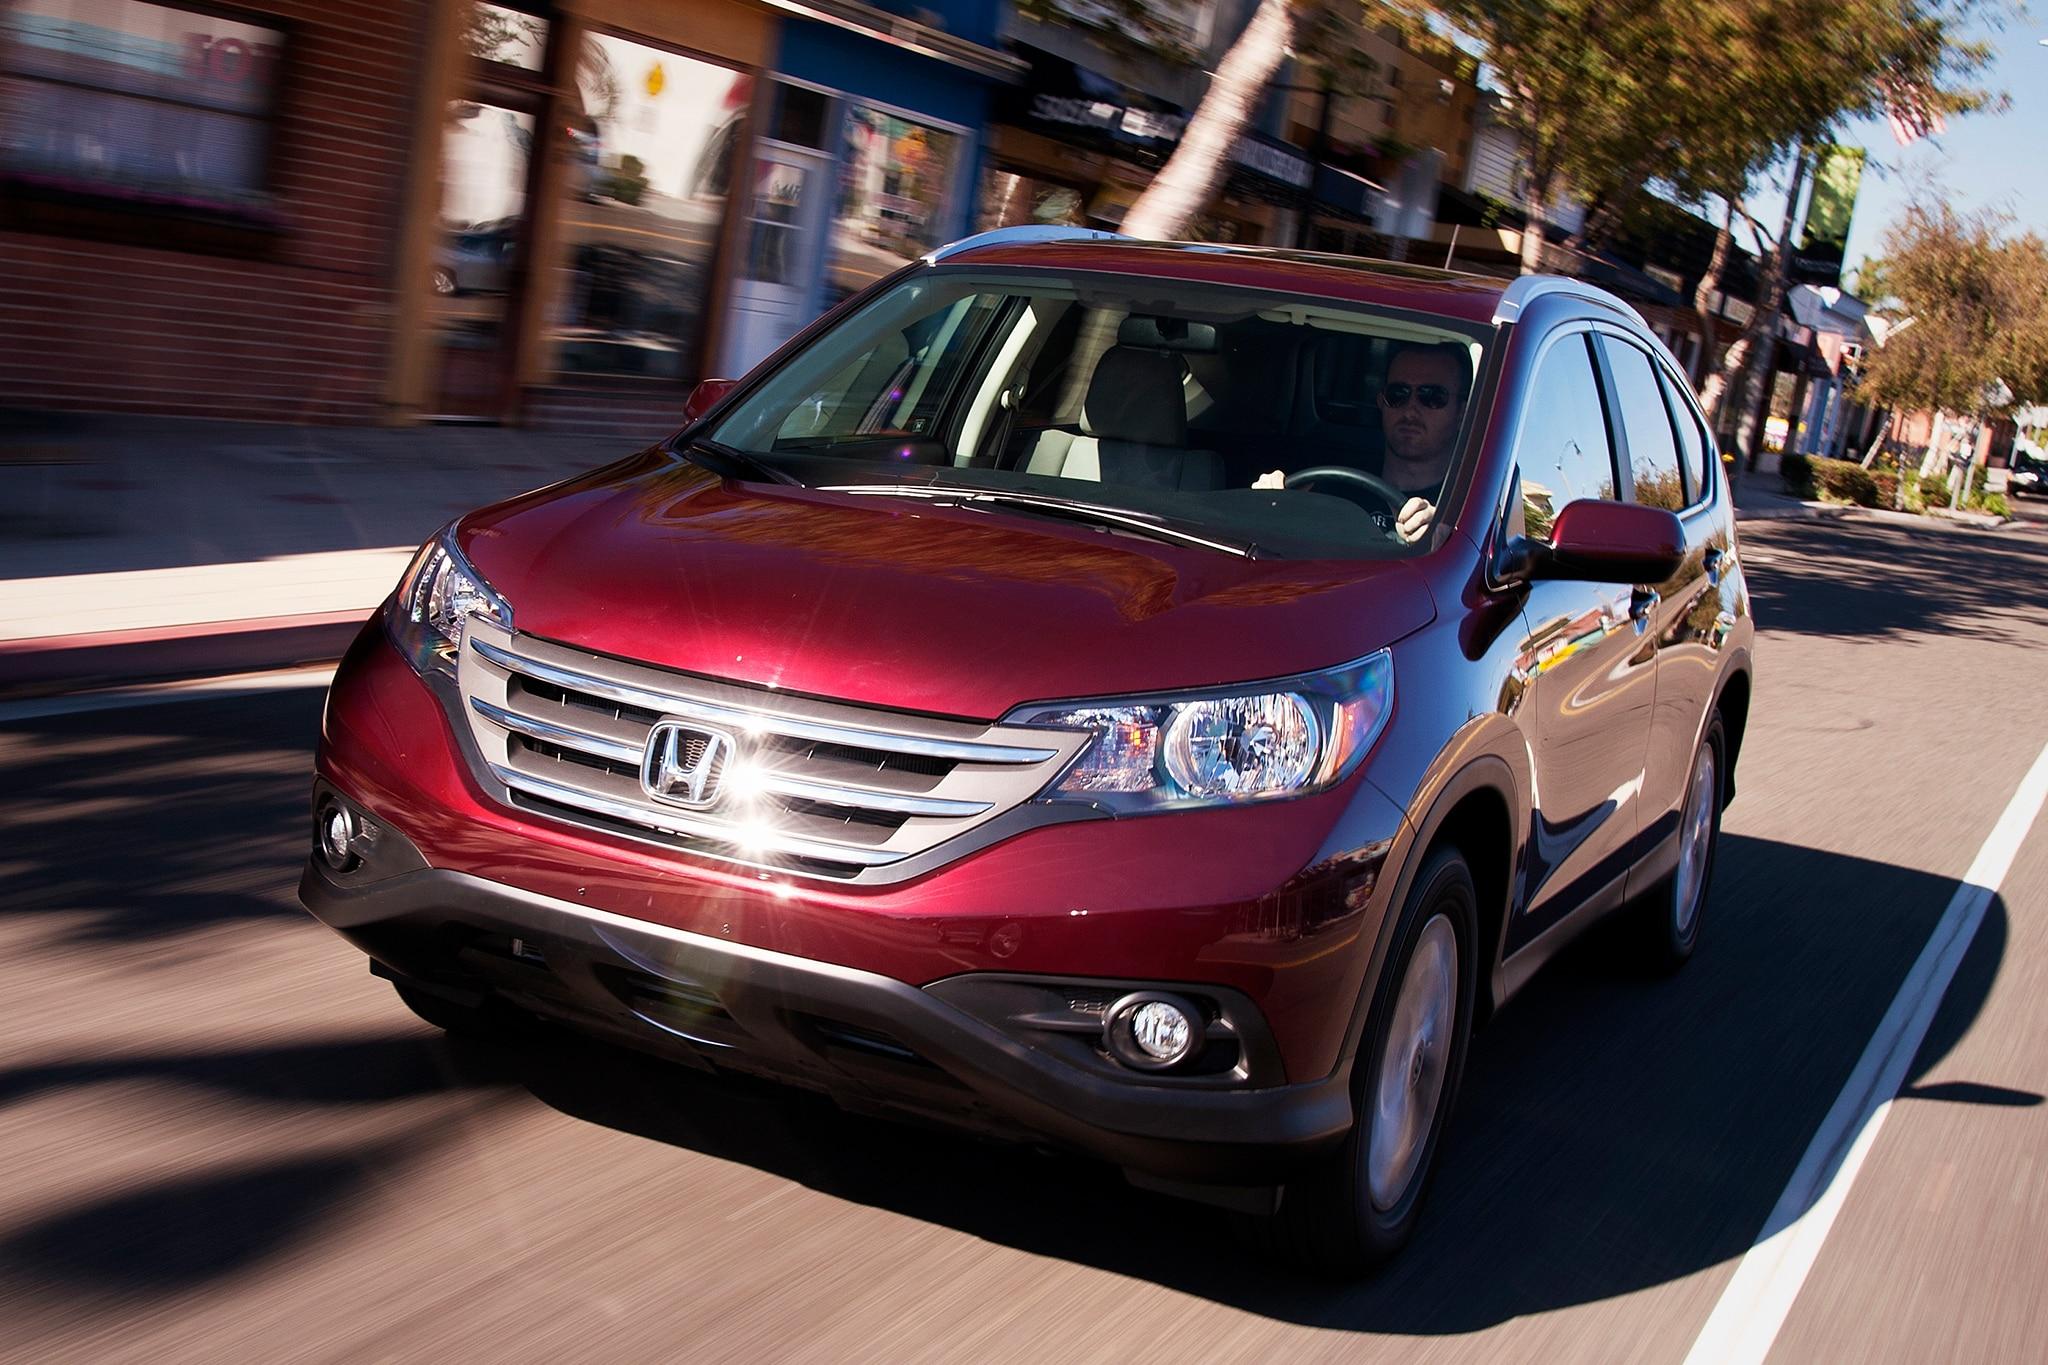 Honda Cr V Toyota Rav4 Move Up In July Cuv Sales